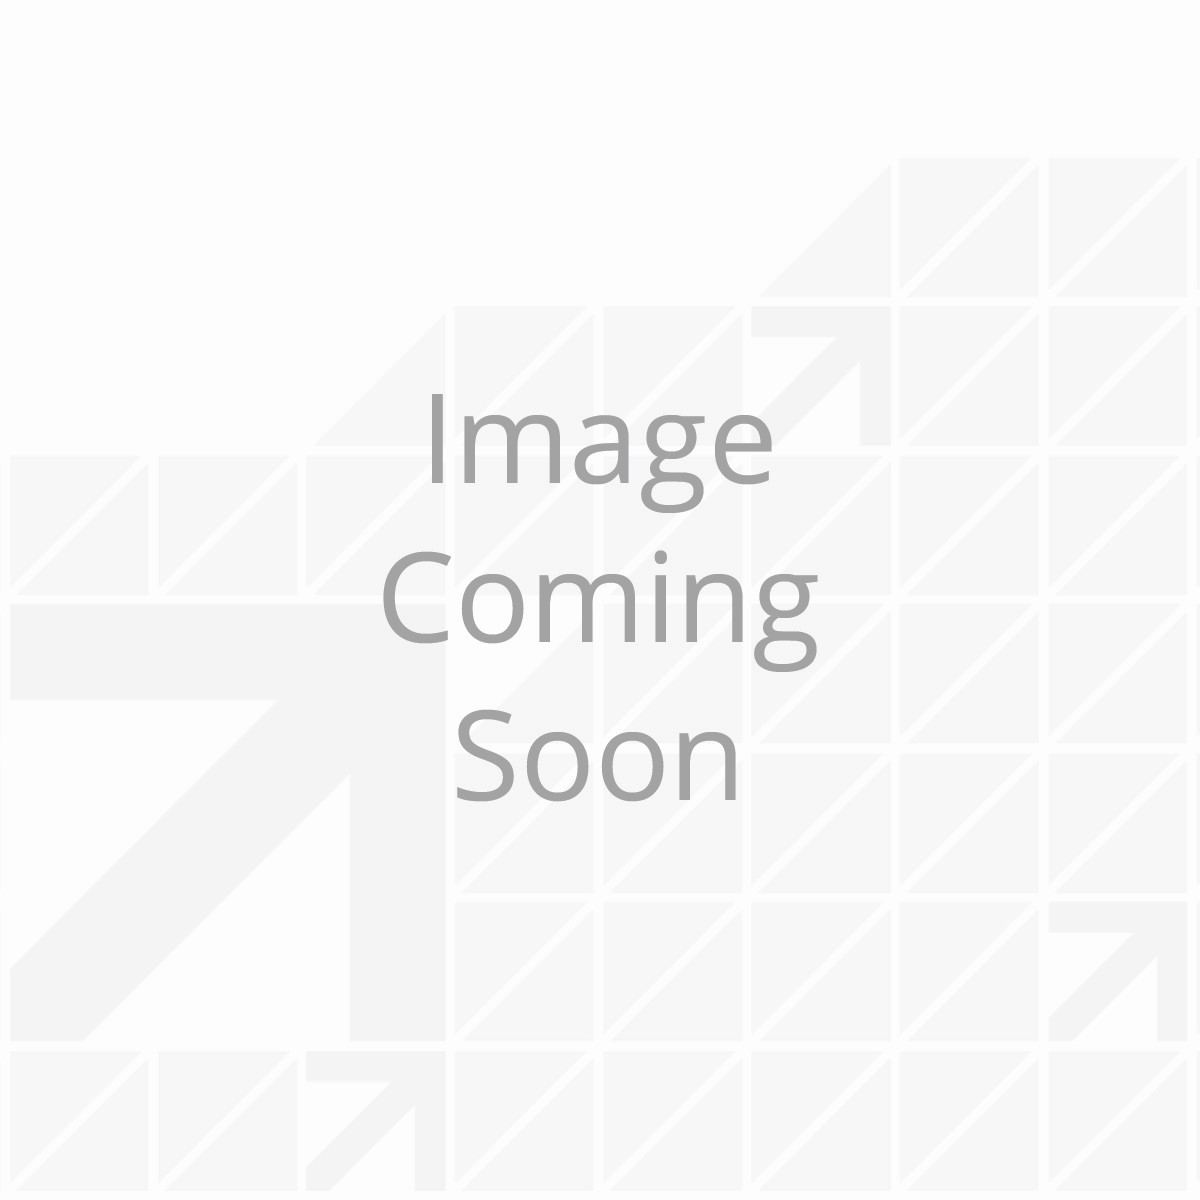 Power Pro Max Portable Pressure Washer